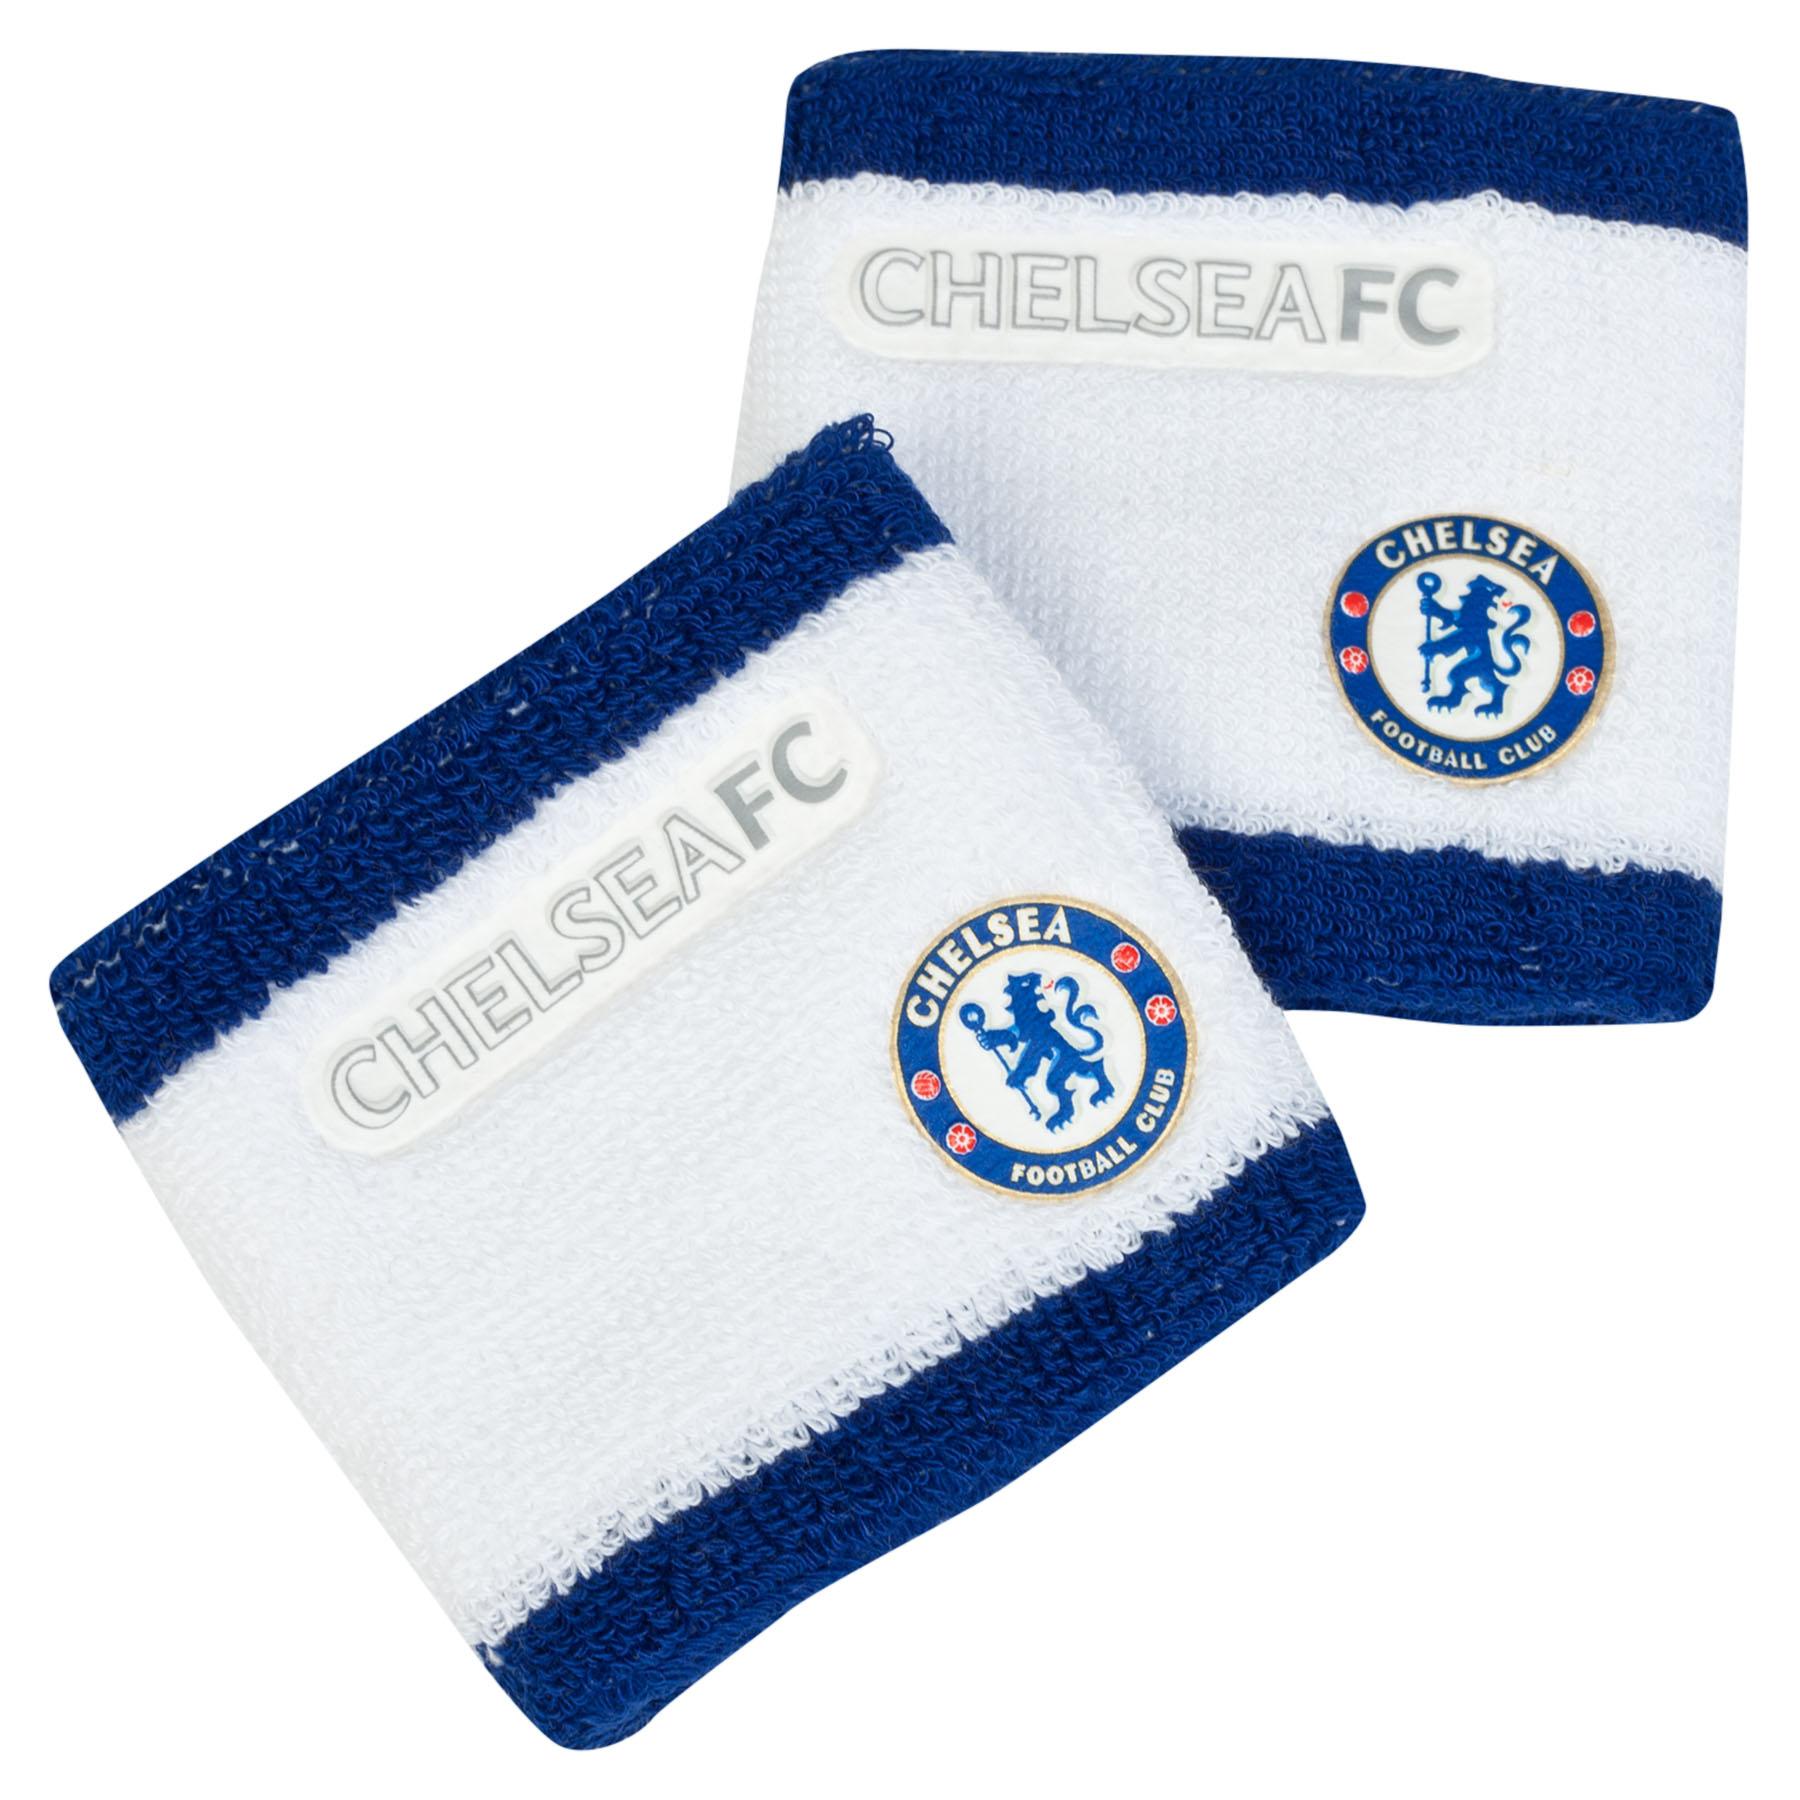 Chelsea Wristbands